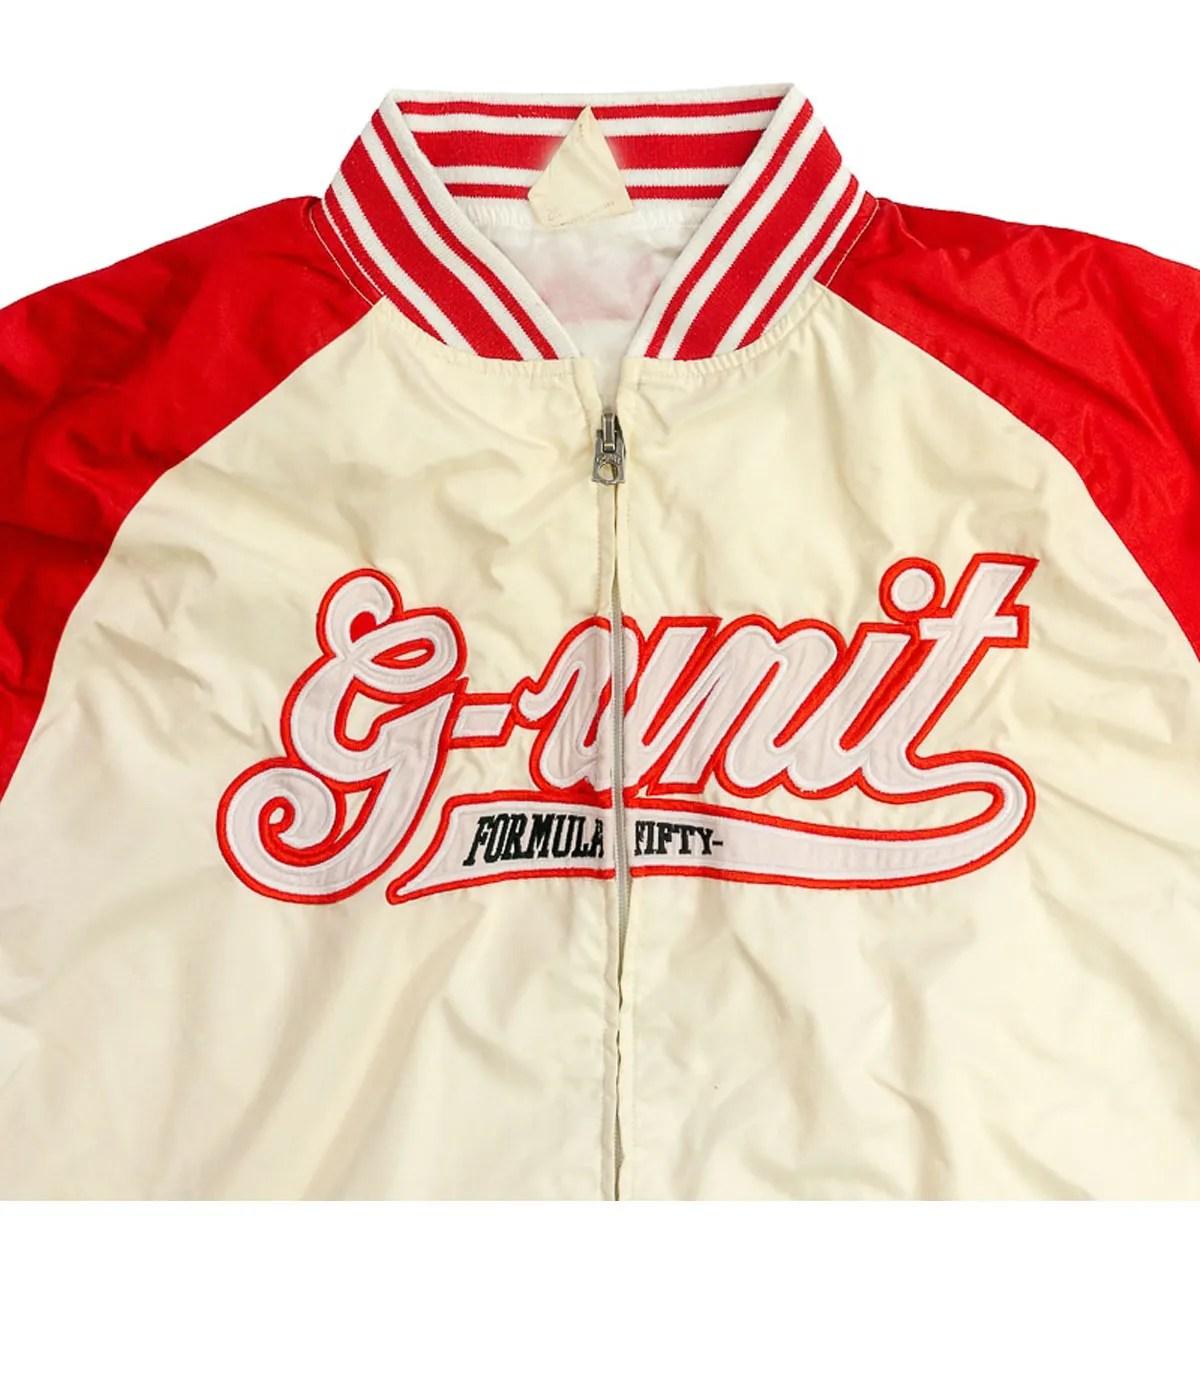 formula-fifty-satin-g-unit-varsity-jacket